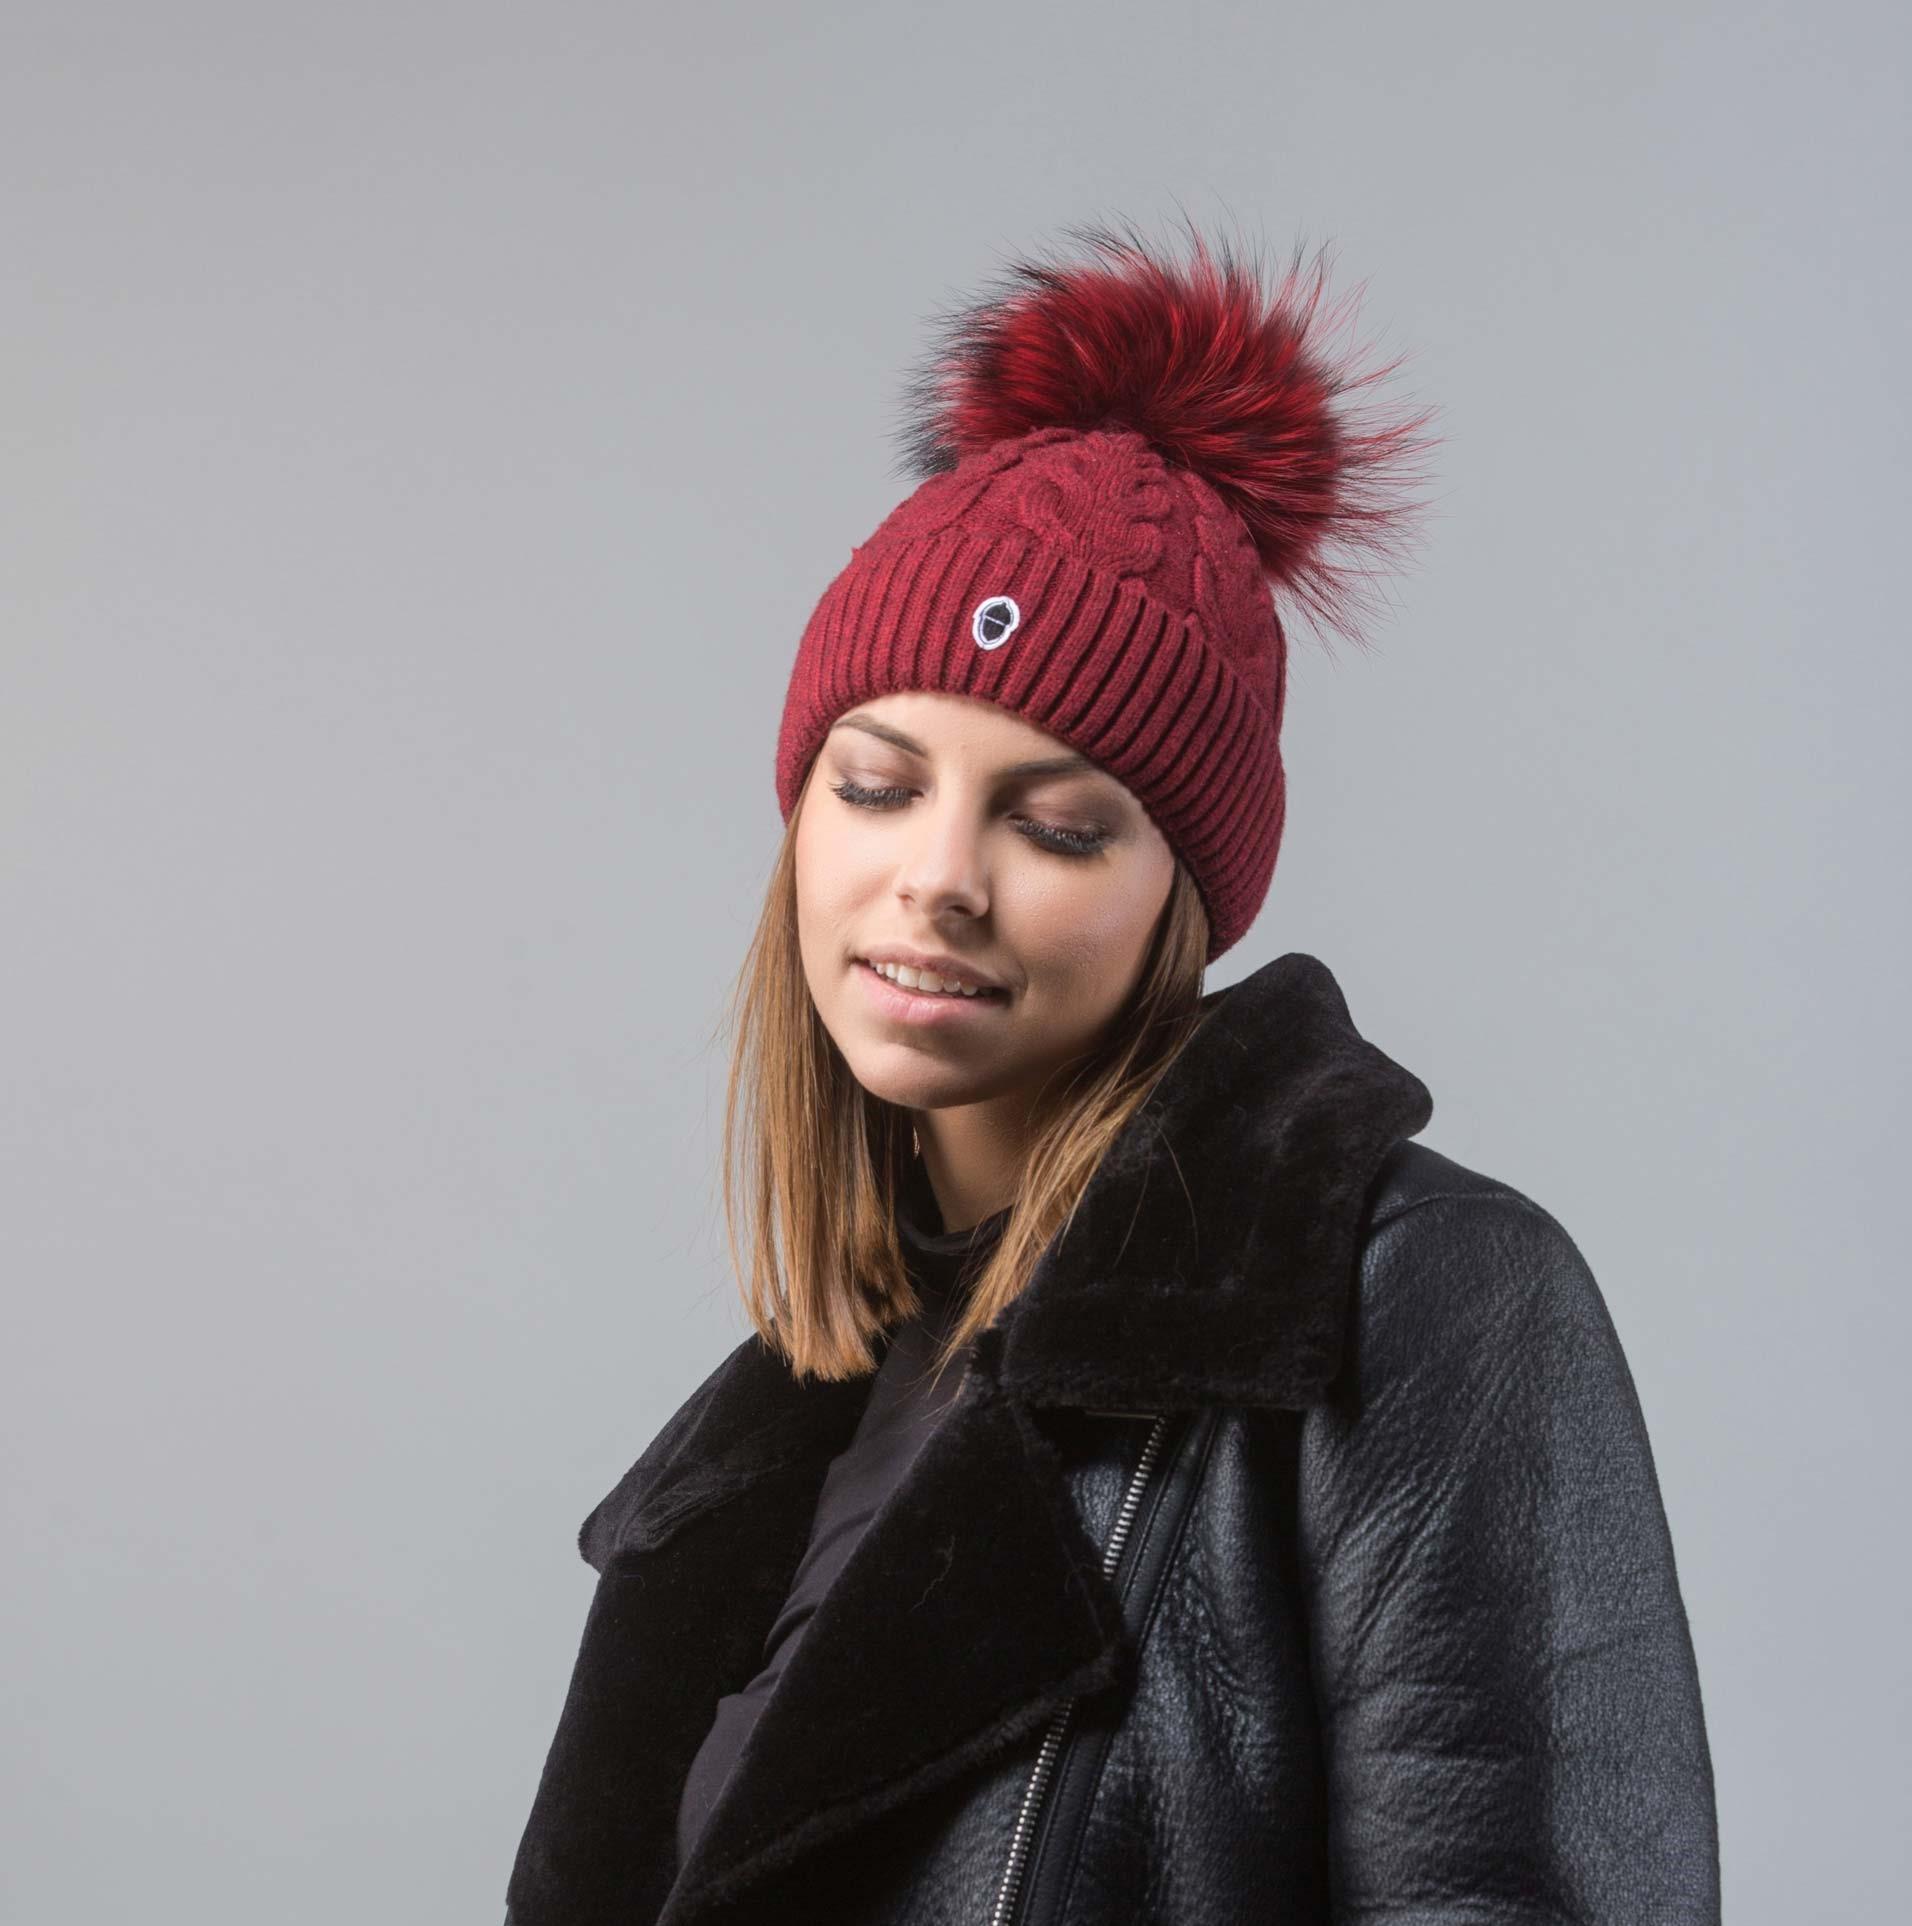 1d017ec4b46 Bordeaux Beanie With Raccoon Fur Pom Pom I 100% Real Fur Hats